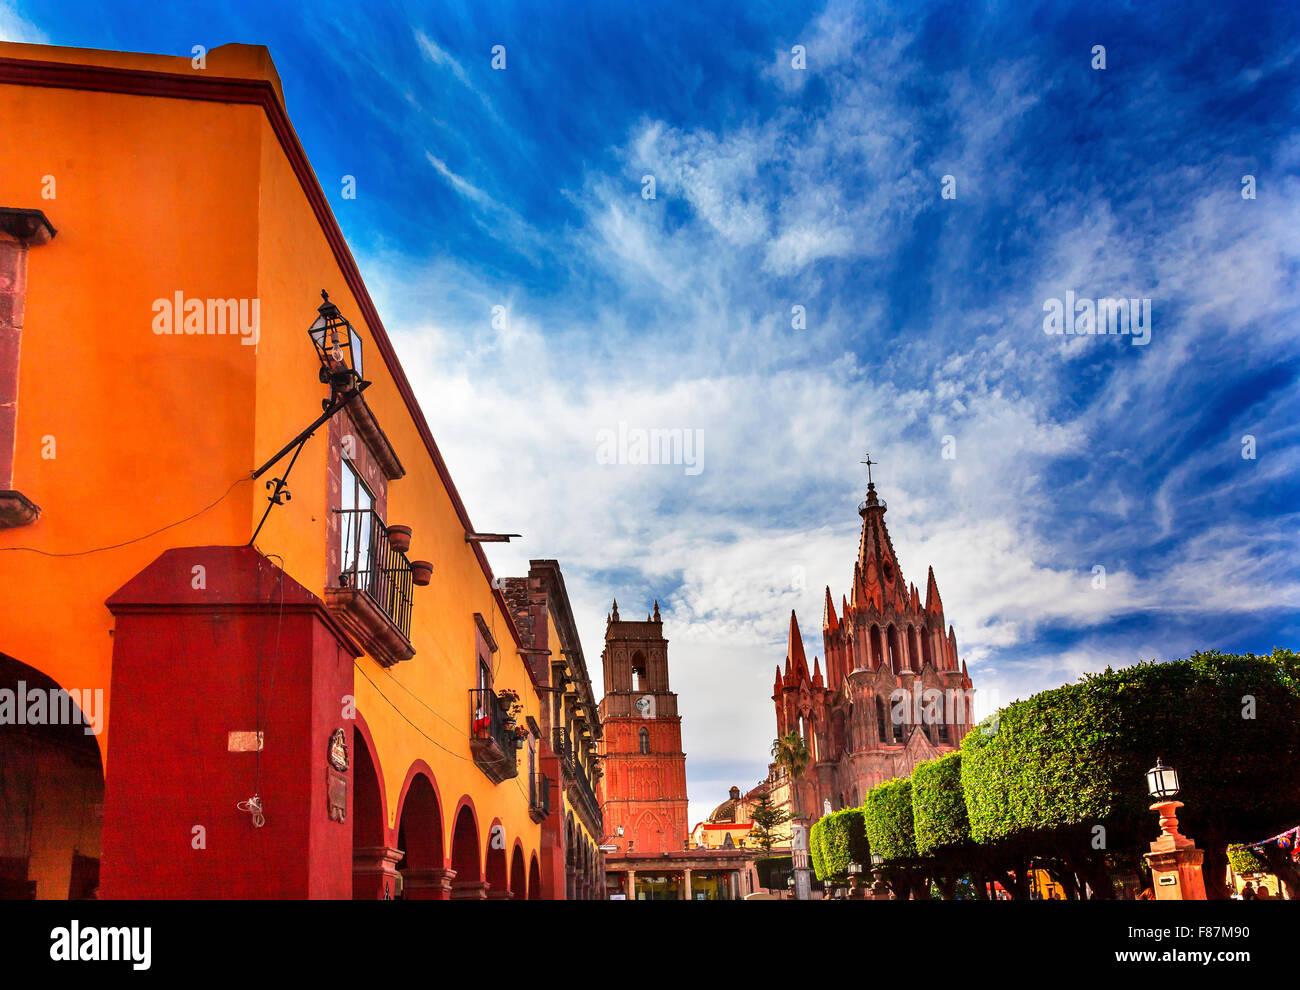 Parroquia Archangel church Jardin Town Square San Miguel de Allende, Mexico. Parroquia created in 1600s. - Stock Image